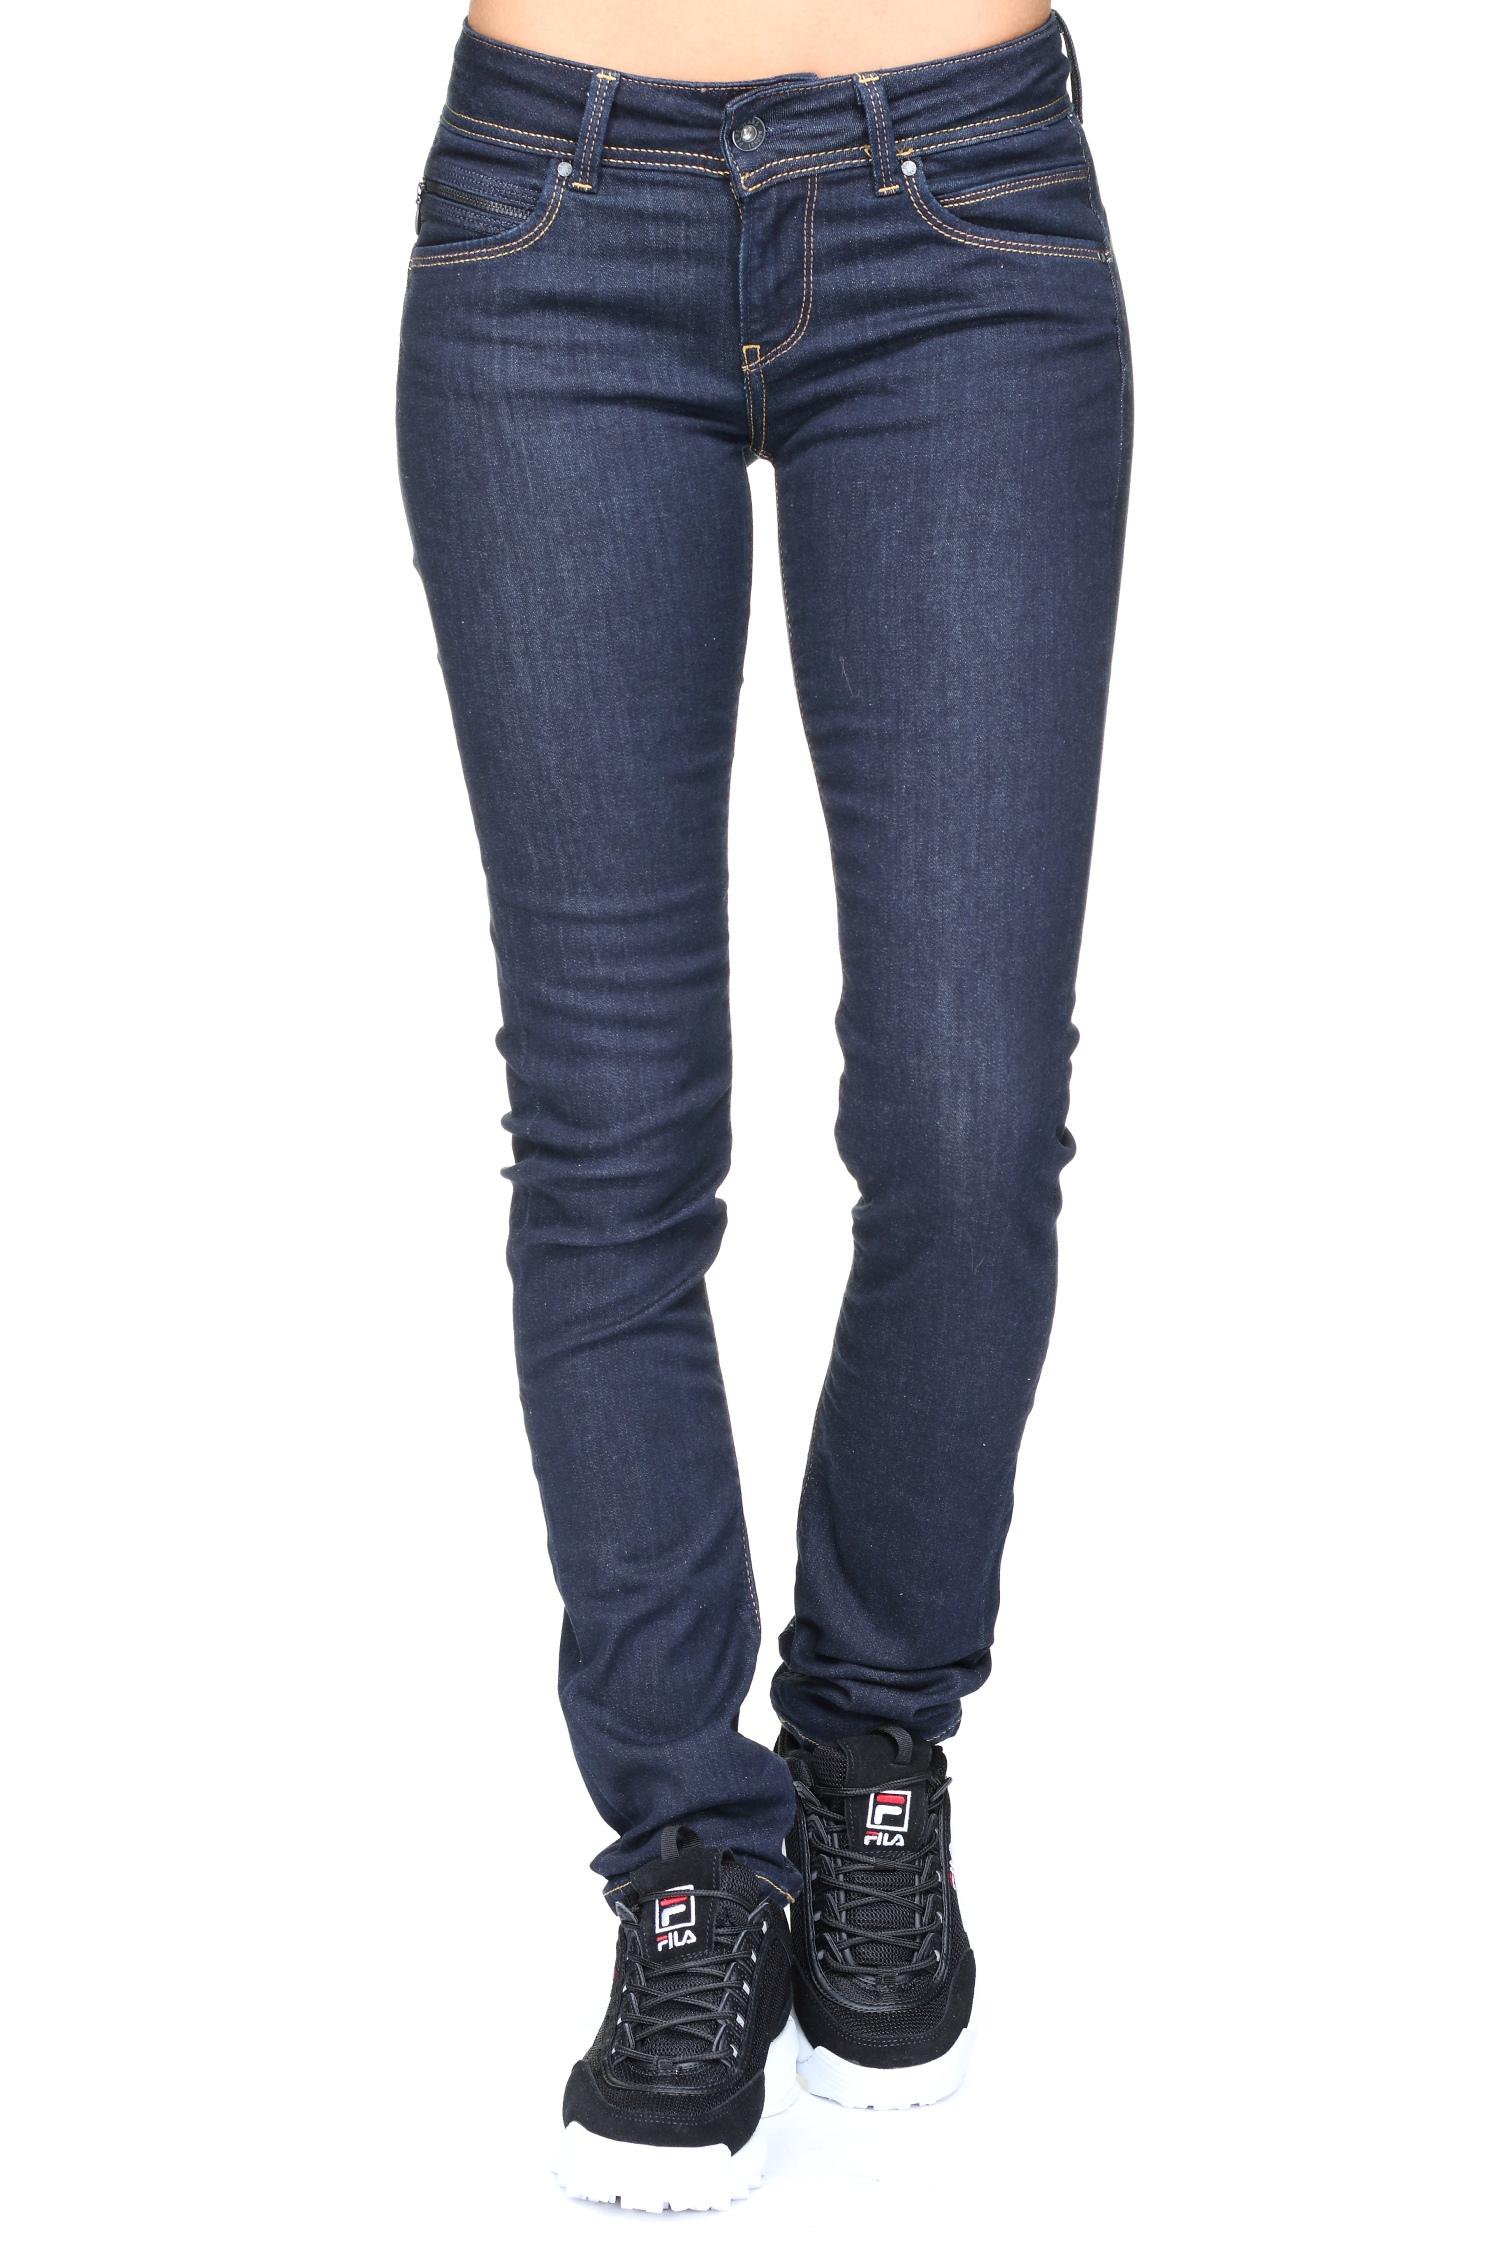 http://www.leadermode.com/171996/pepe-jeans-new-brooke-pl200019m15-bleu.jpg